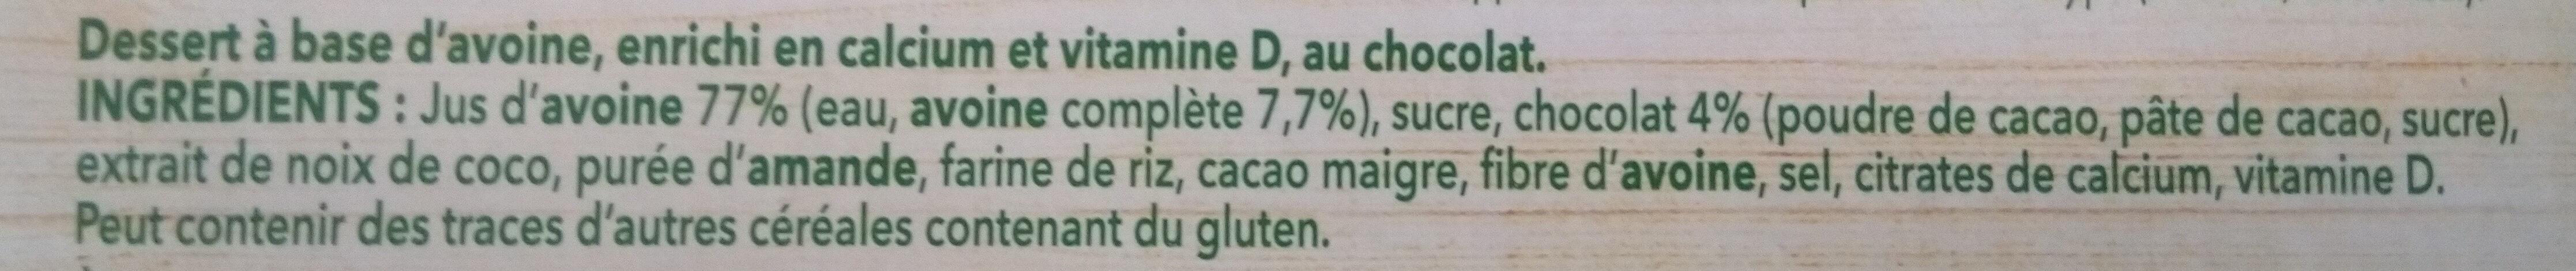 Dessert végétal chocolat à l'avoine - Ingrediënten - fr